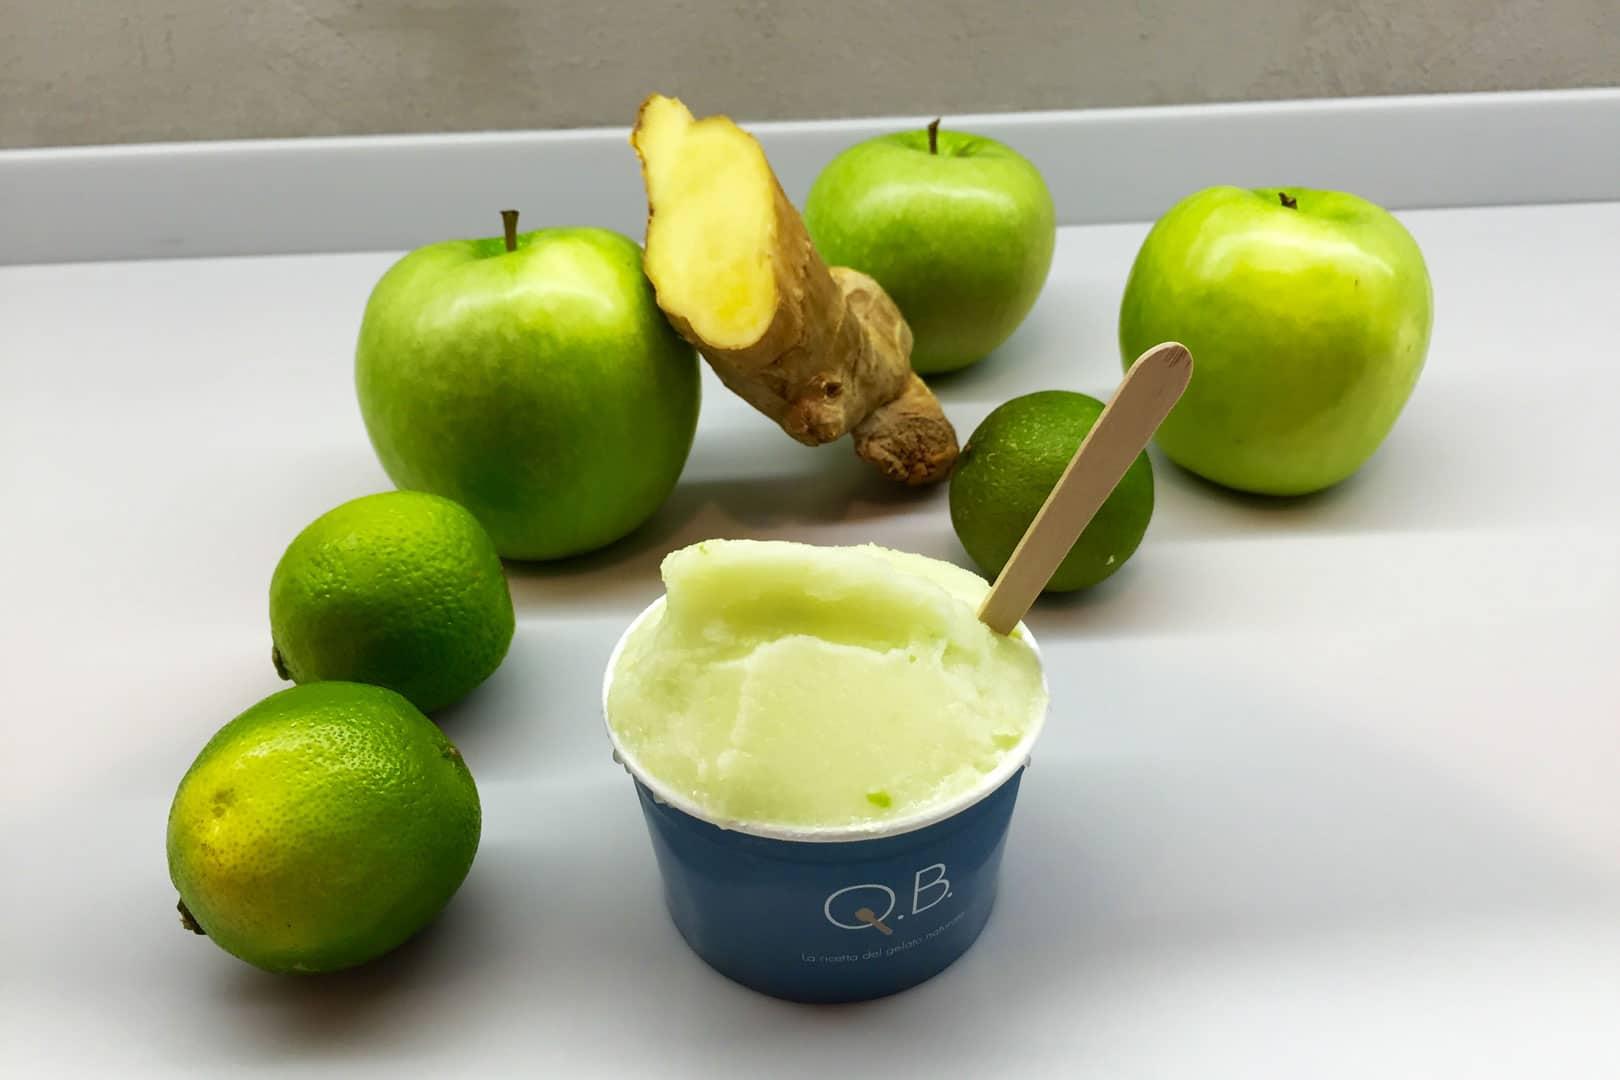 Q.B. Gelato - gusto zenzero, mela verde e lime